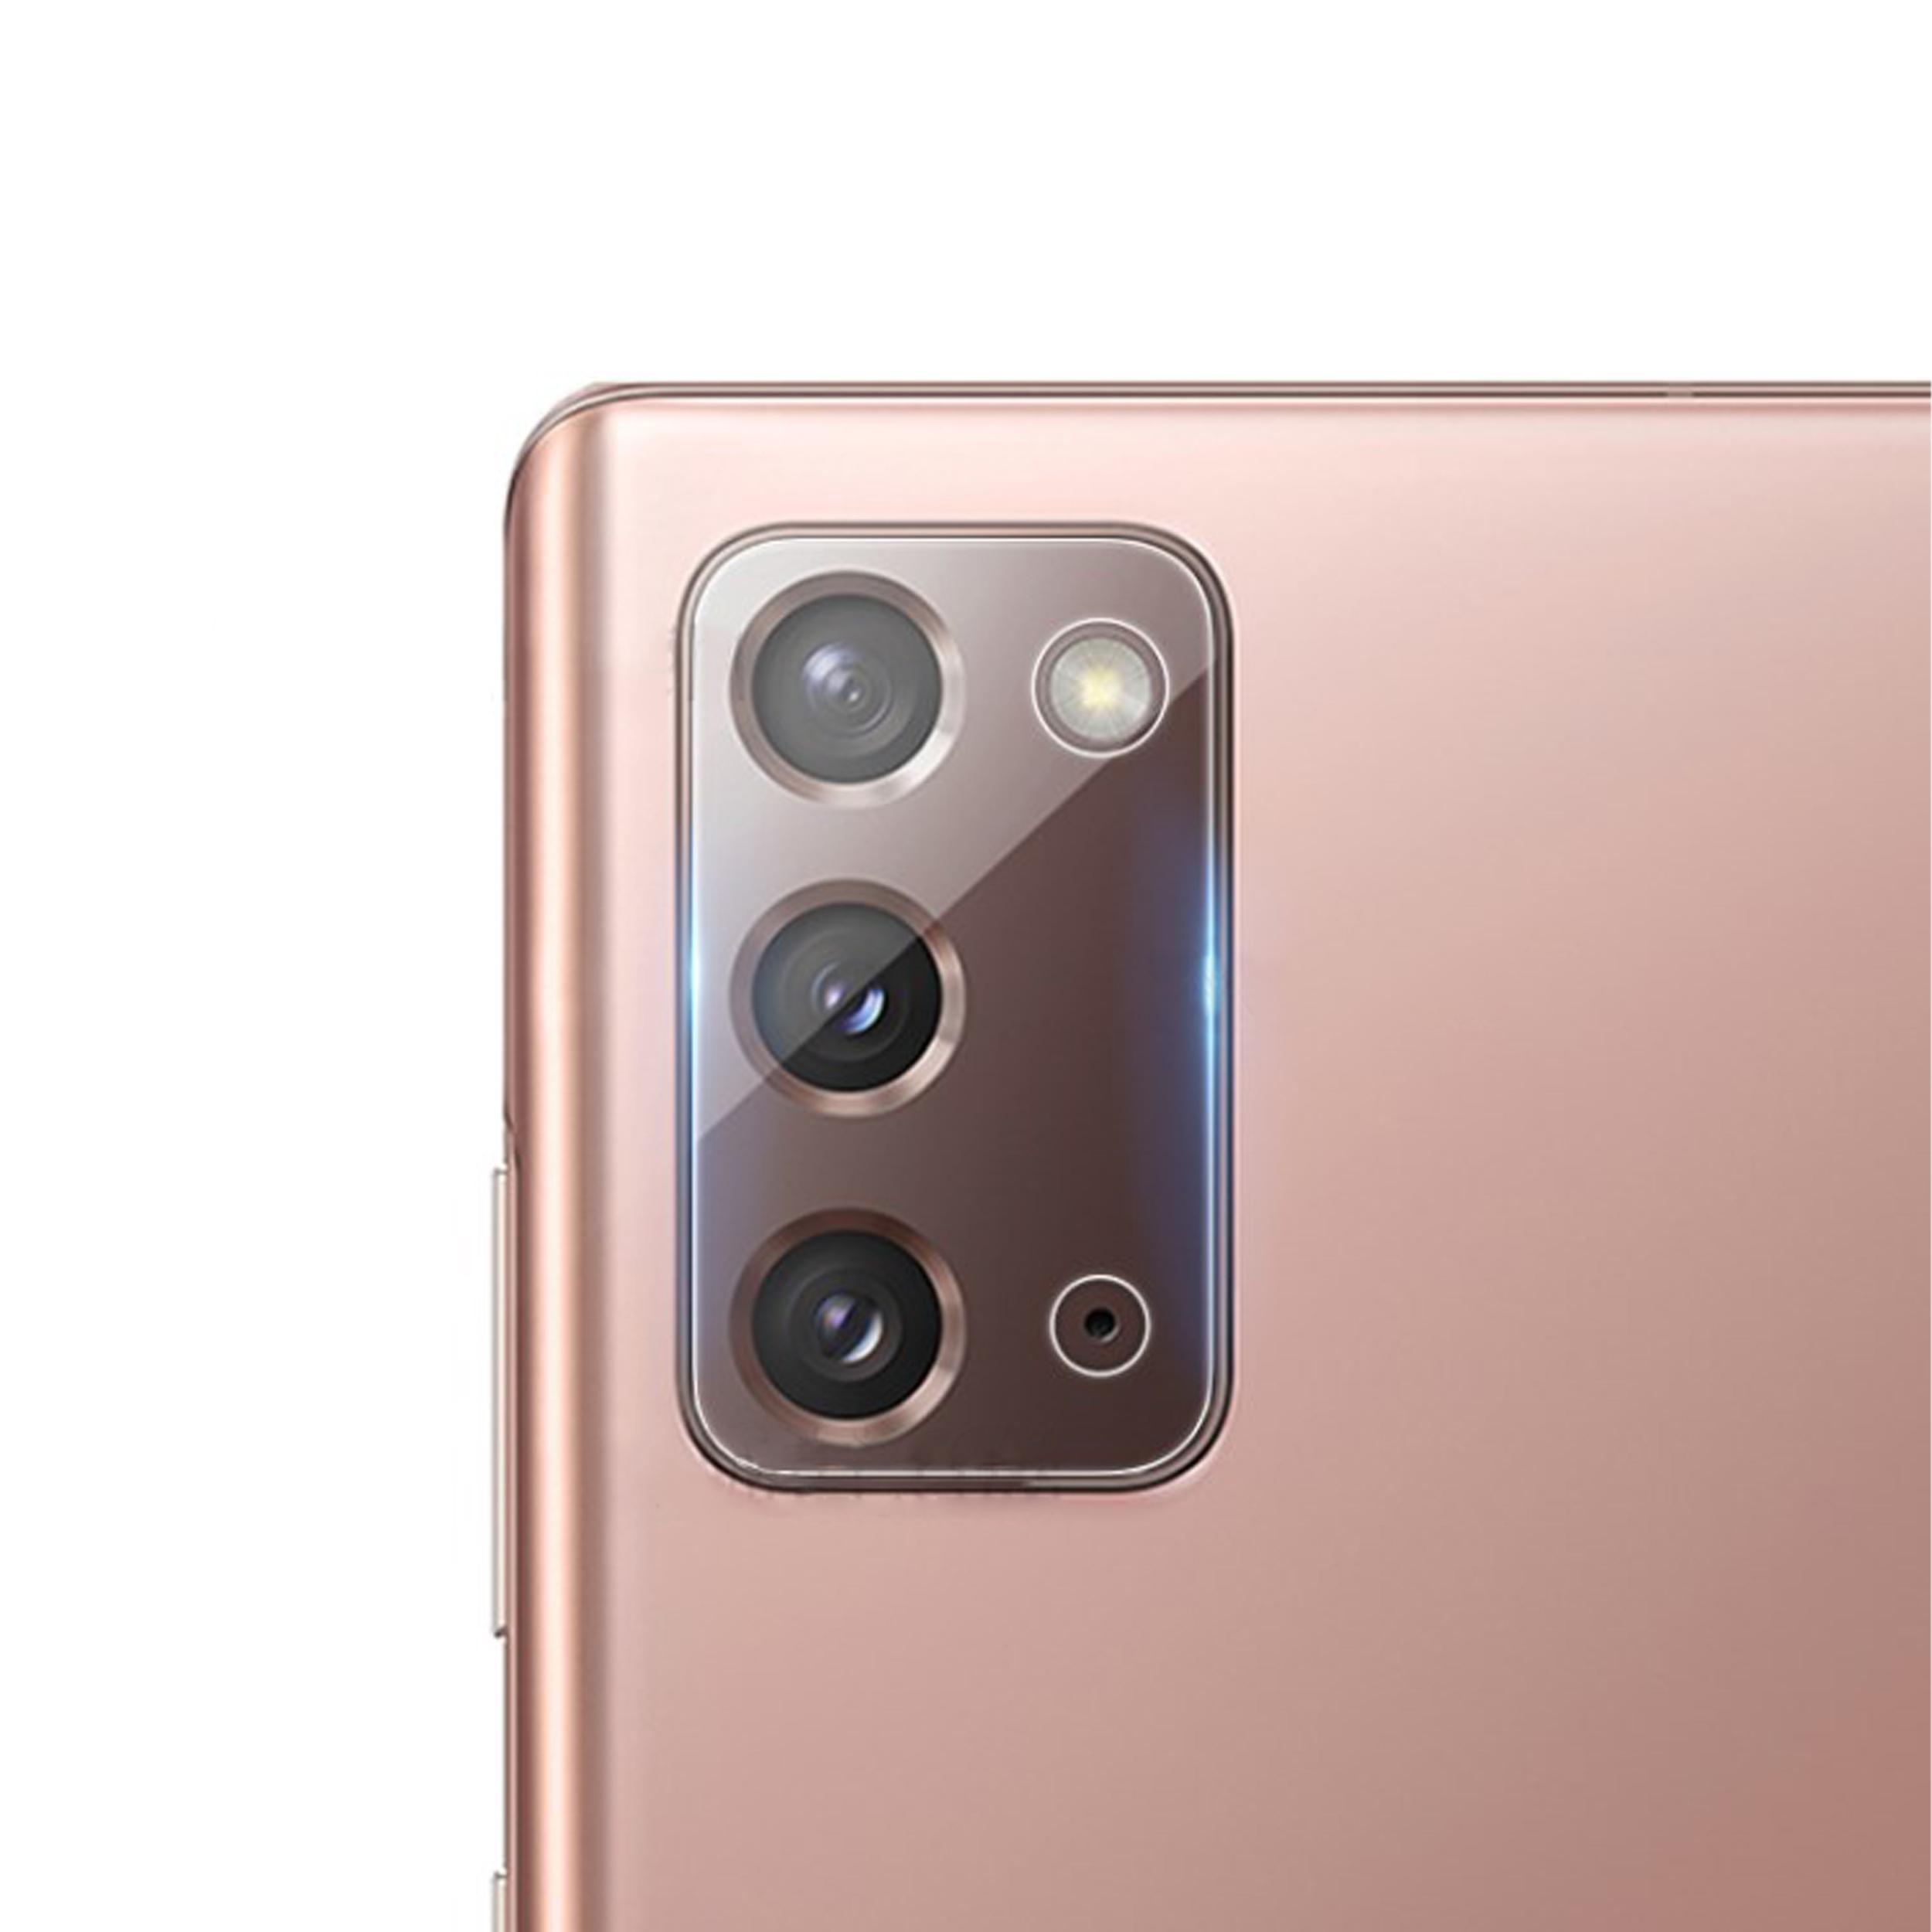 محافظ لنز دوربین سیحان مدل GLP مناسب برای گوشی موبایل سامسونگ Galaxy Note 20 main 1 2